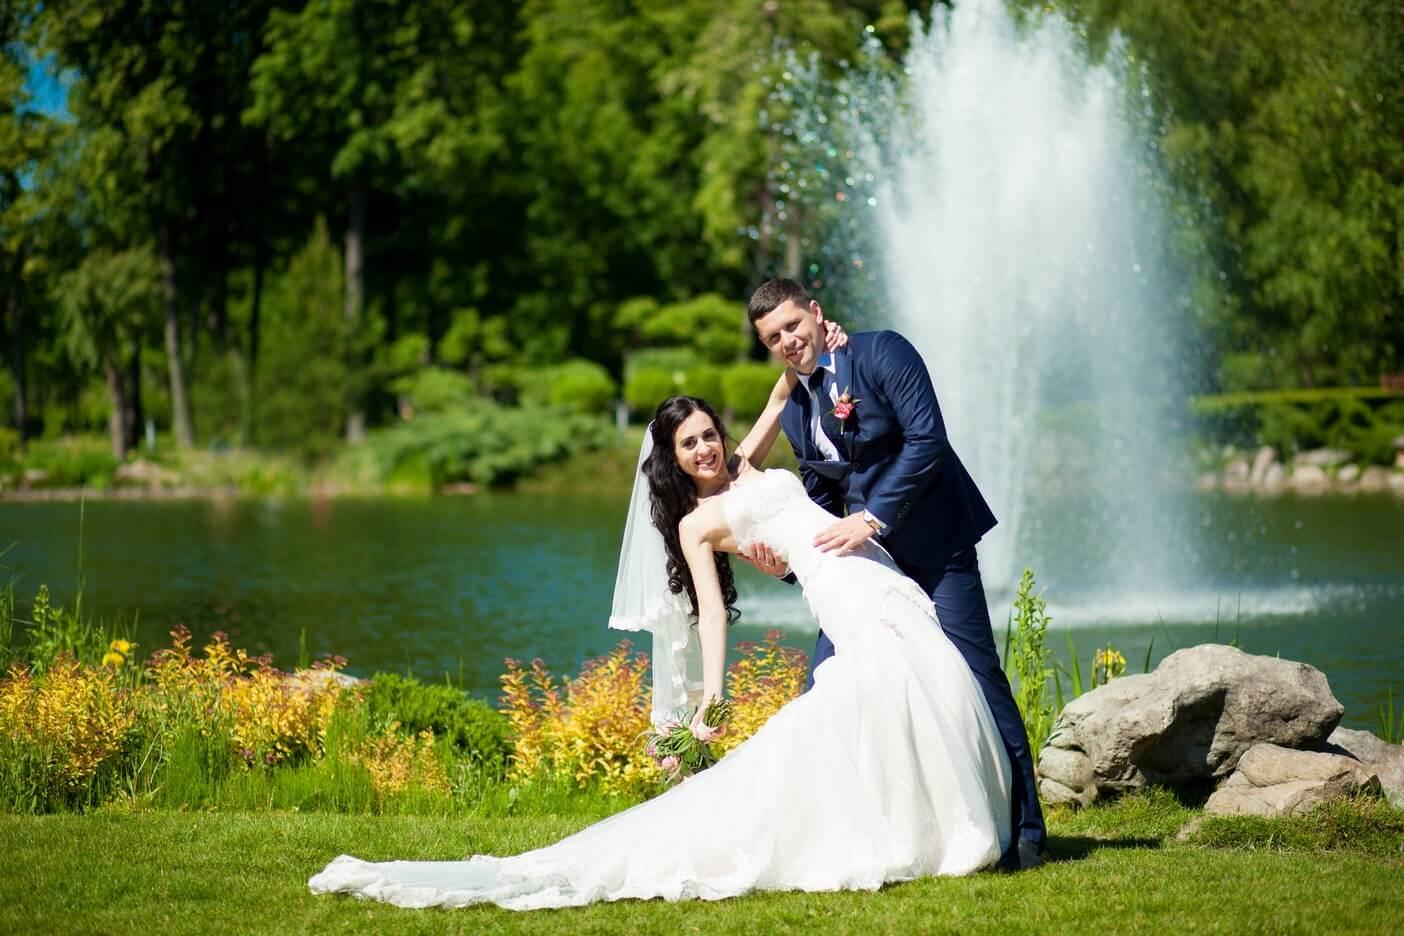 professional'nyj fotograf kiev ceny fotosessii kiev ceny fotograf na svad'bu v kieve (4)